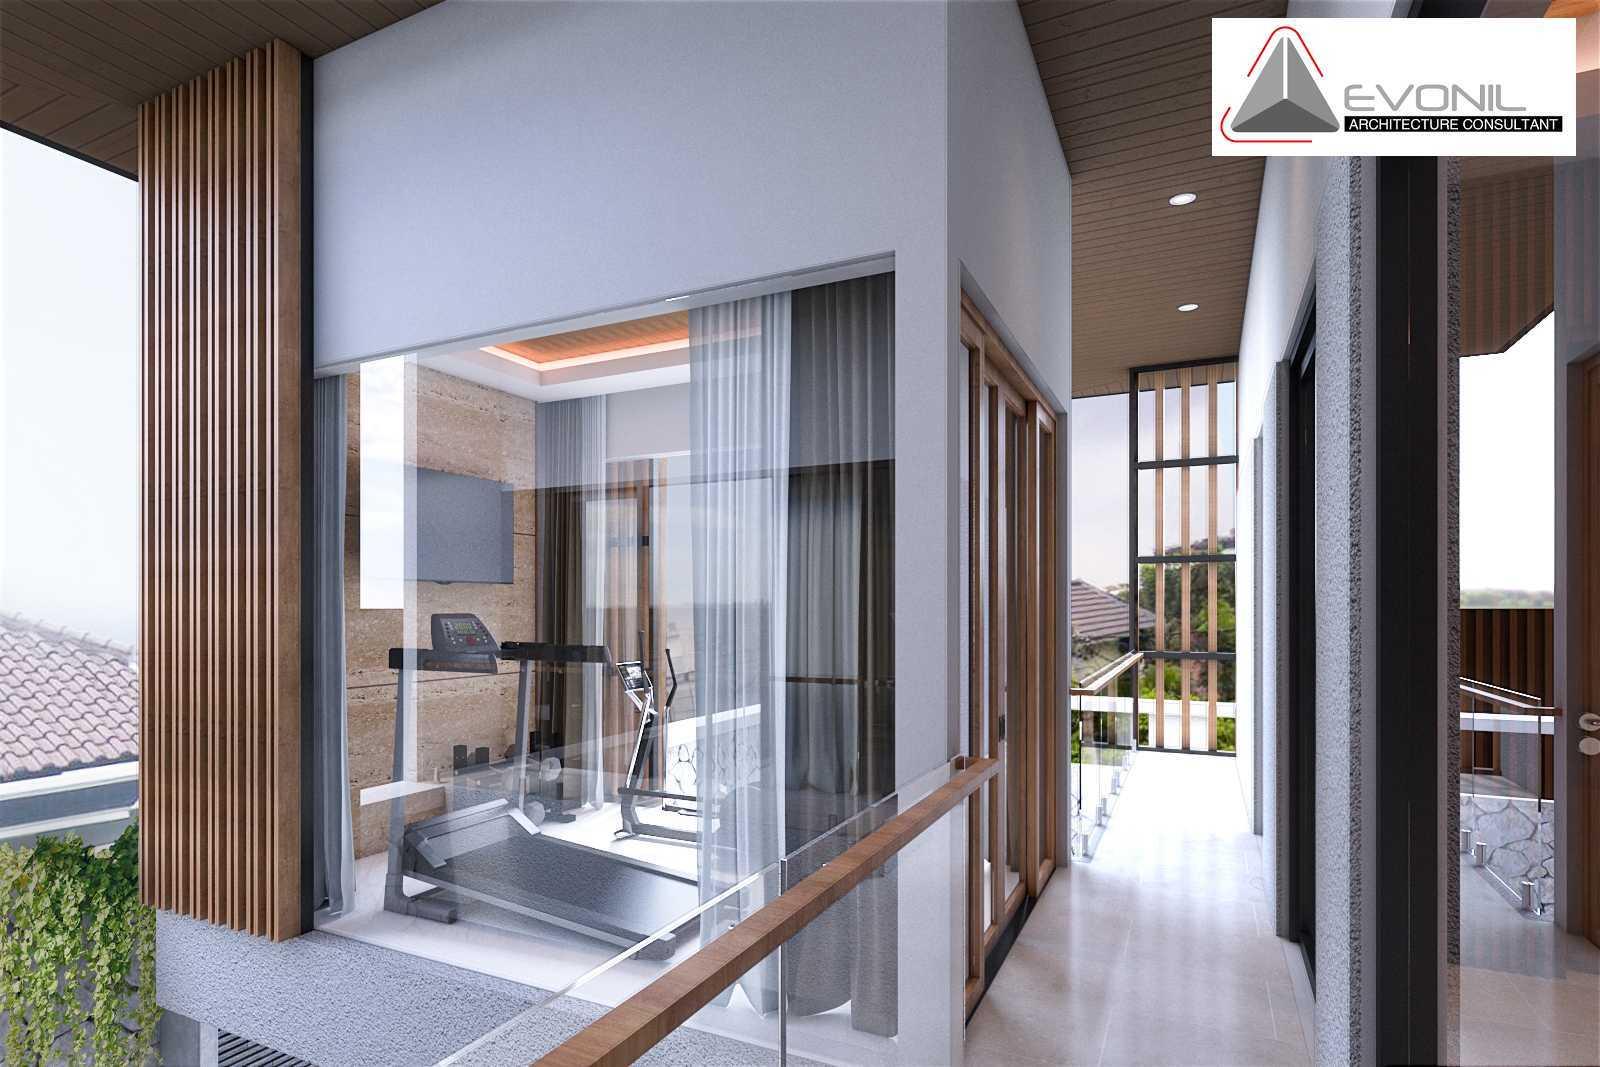 Foto inspirasi ide desain gym Gym room residence sunter evonil architecture oleh EVONIL Architecture di Arsitag